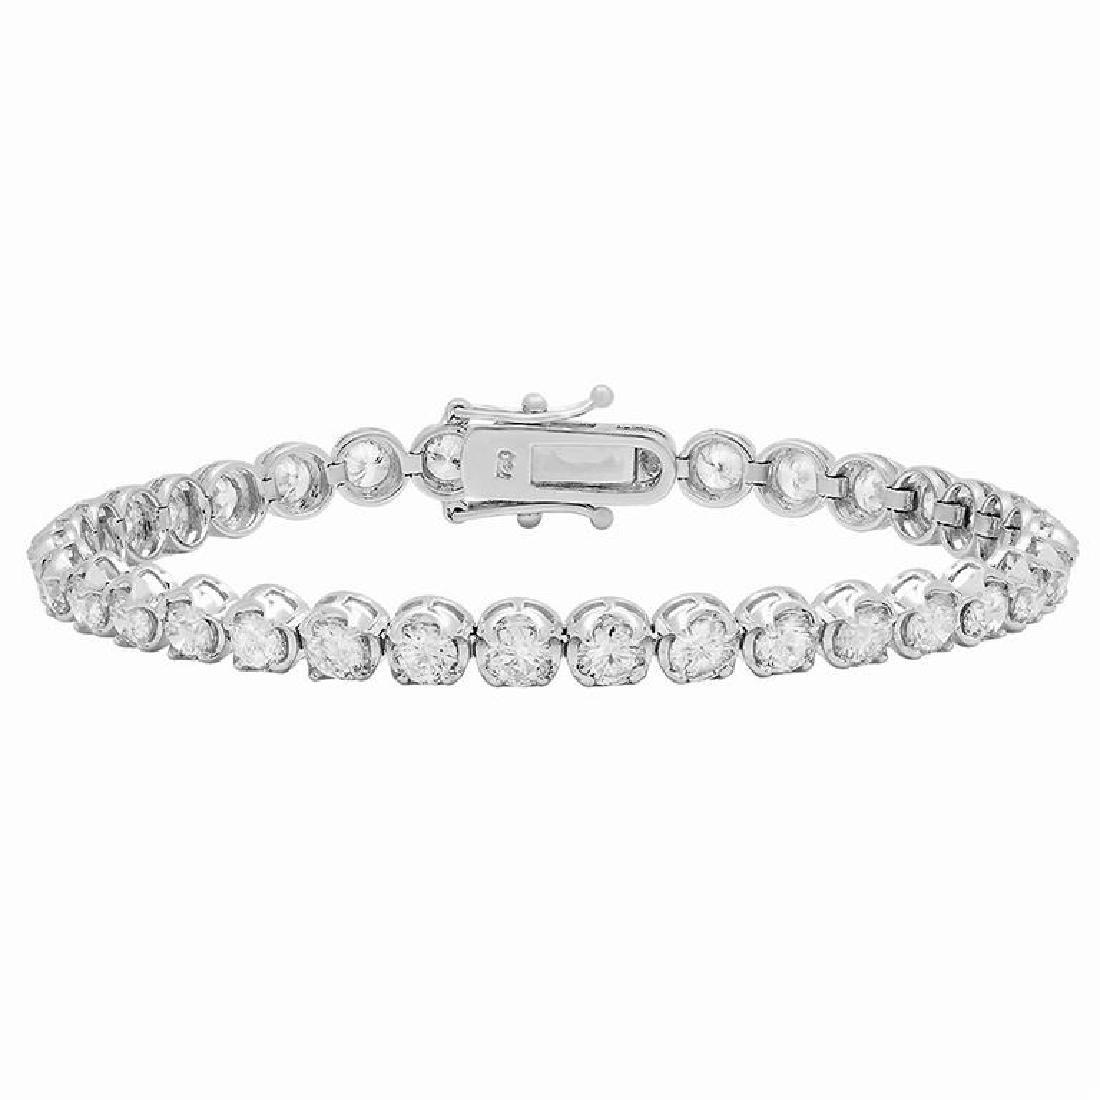 18k White Gold 8.19ct Diamond Tennis Bracelet